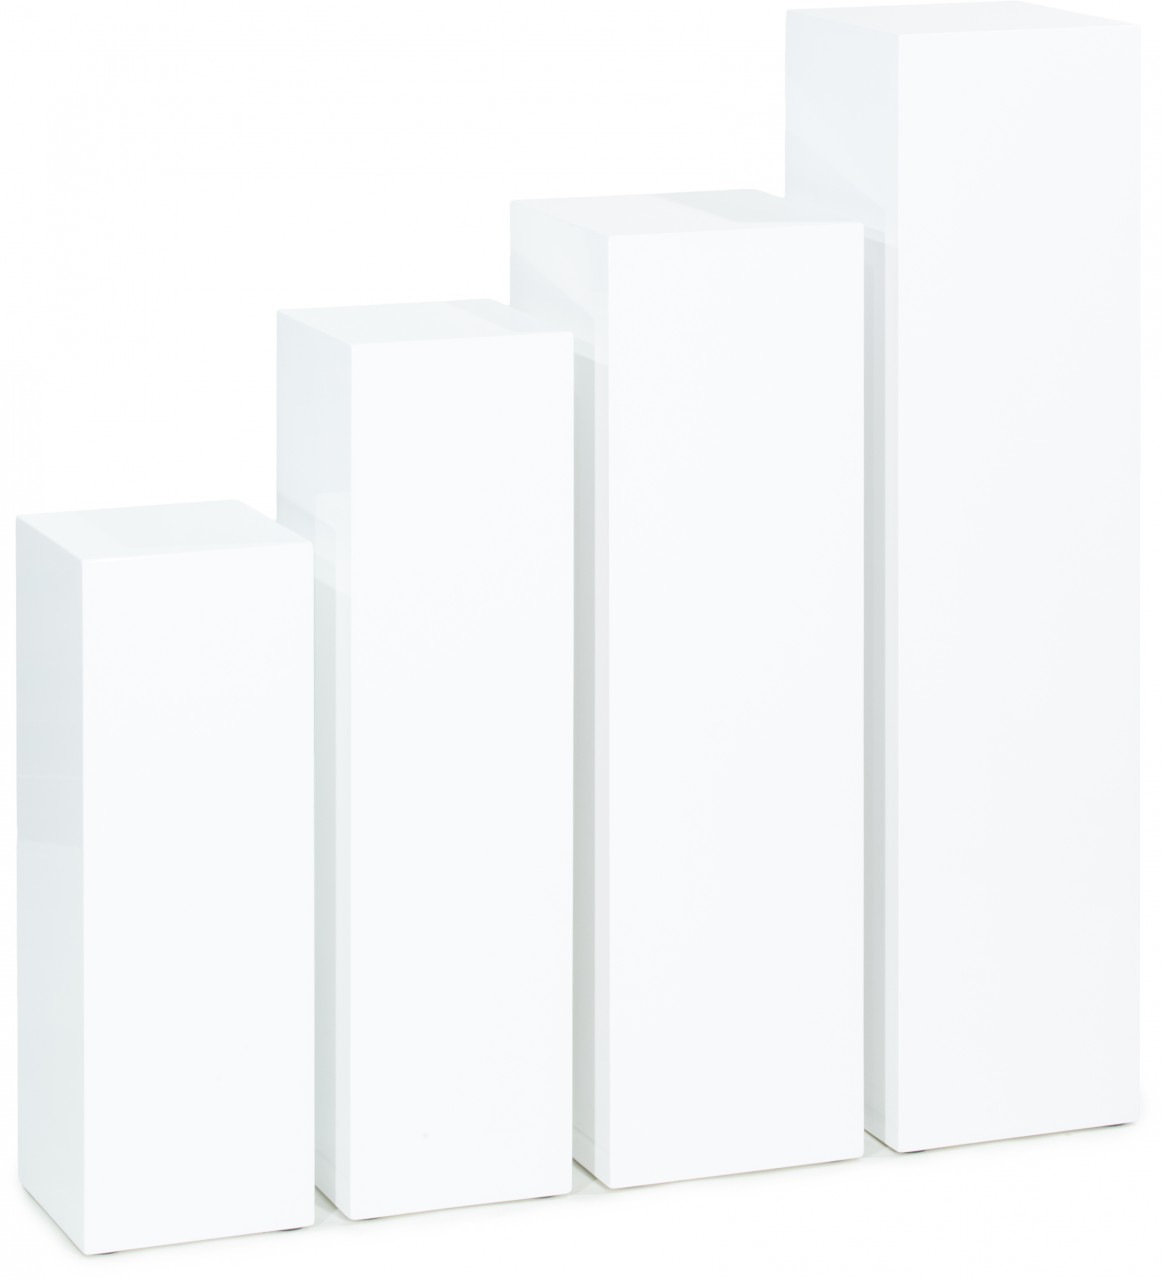 SKY Säule, 25x25/70 cm, weiß hochglanz